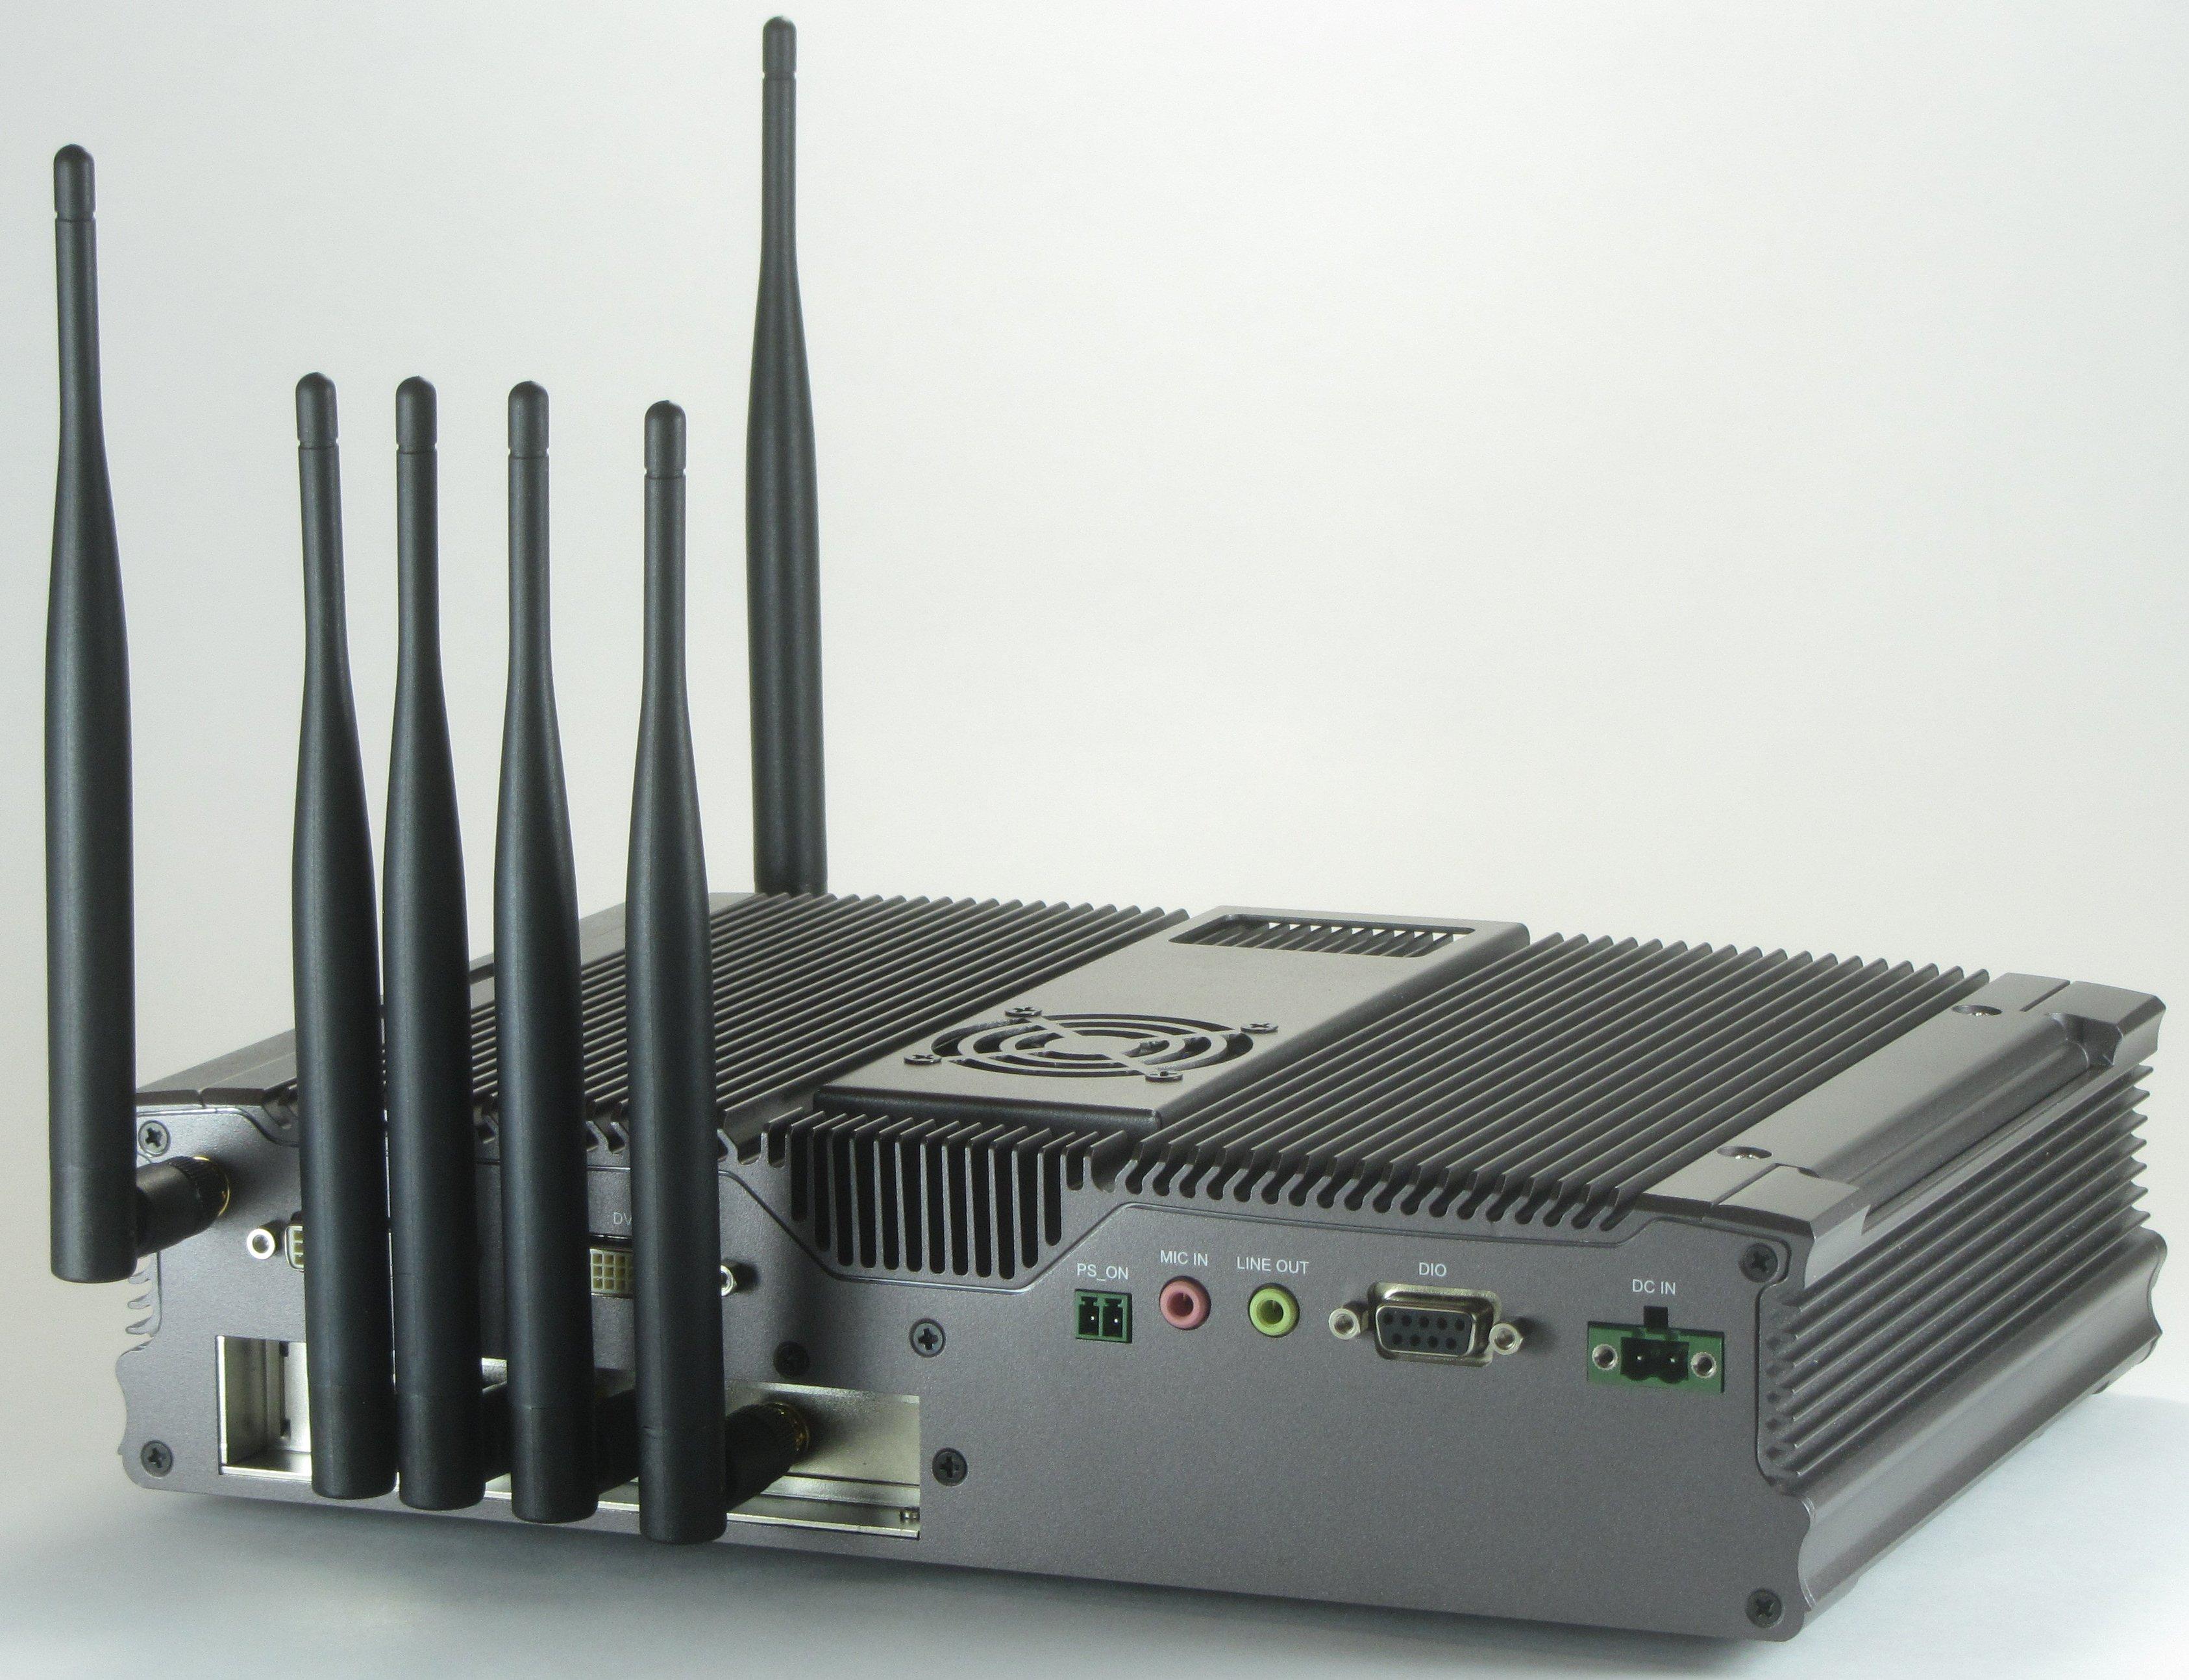 CT521-64 LANforge WiFIRE 802 11a/b/g/n dual-radio WiFi Traffic